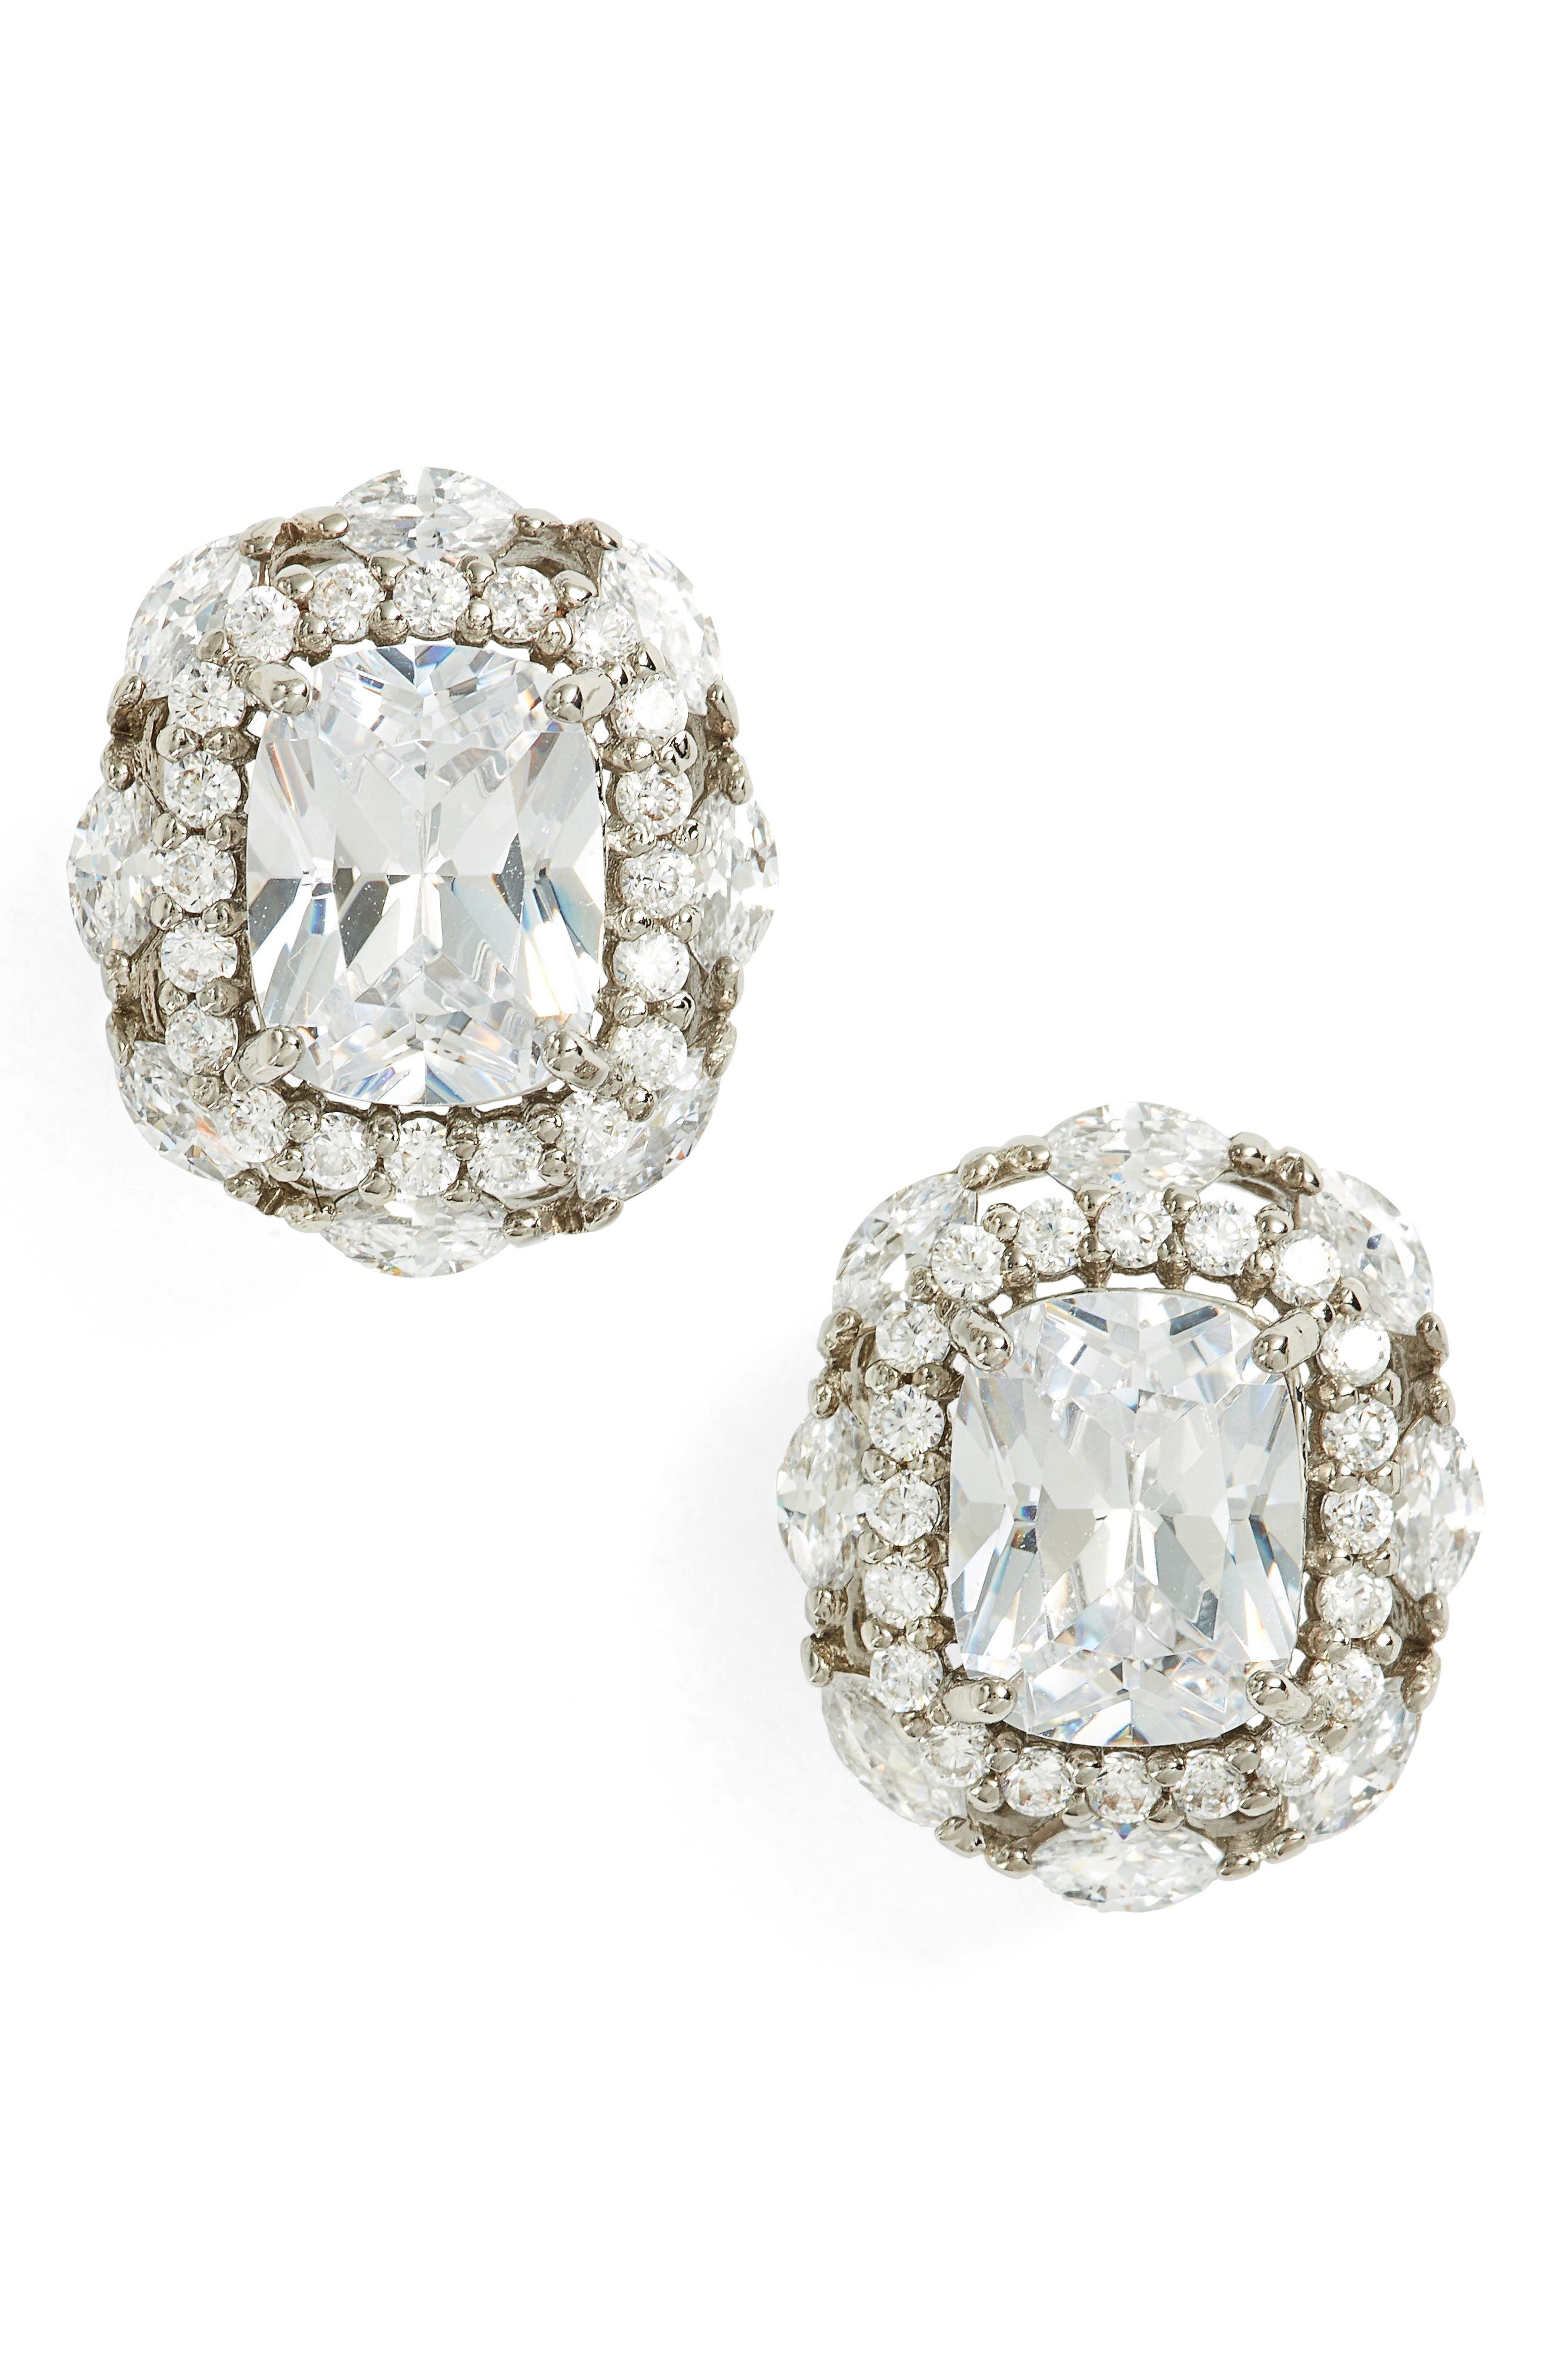 Nina Estate Jewelry Cubic Zirconia Stud Earrings